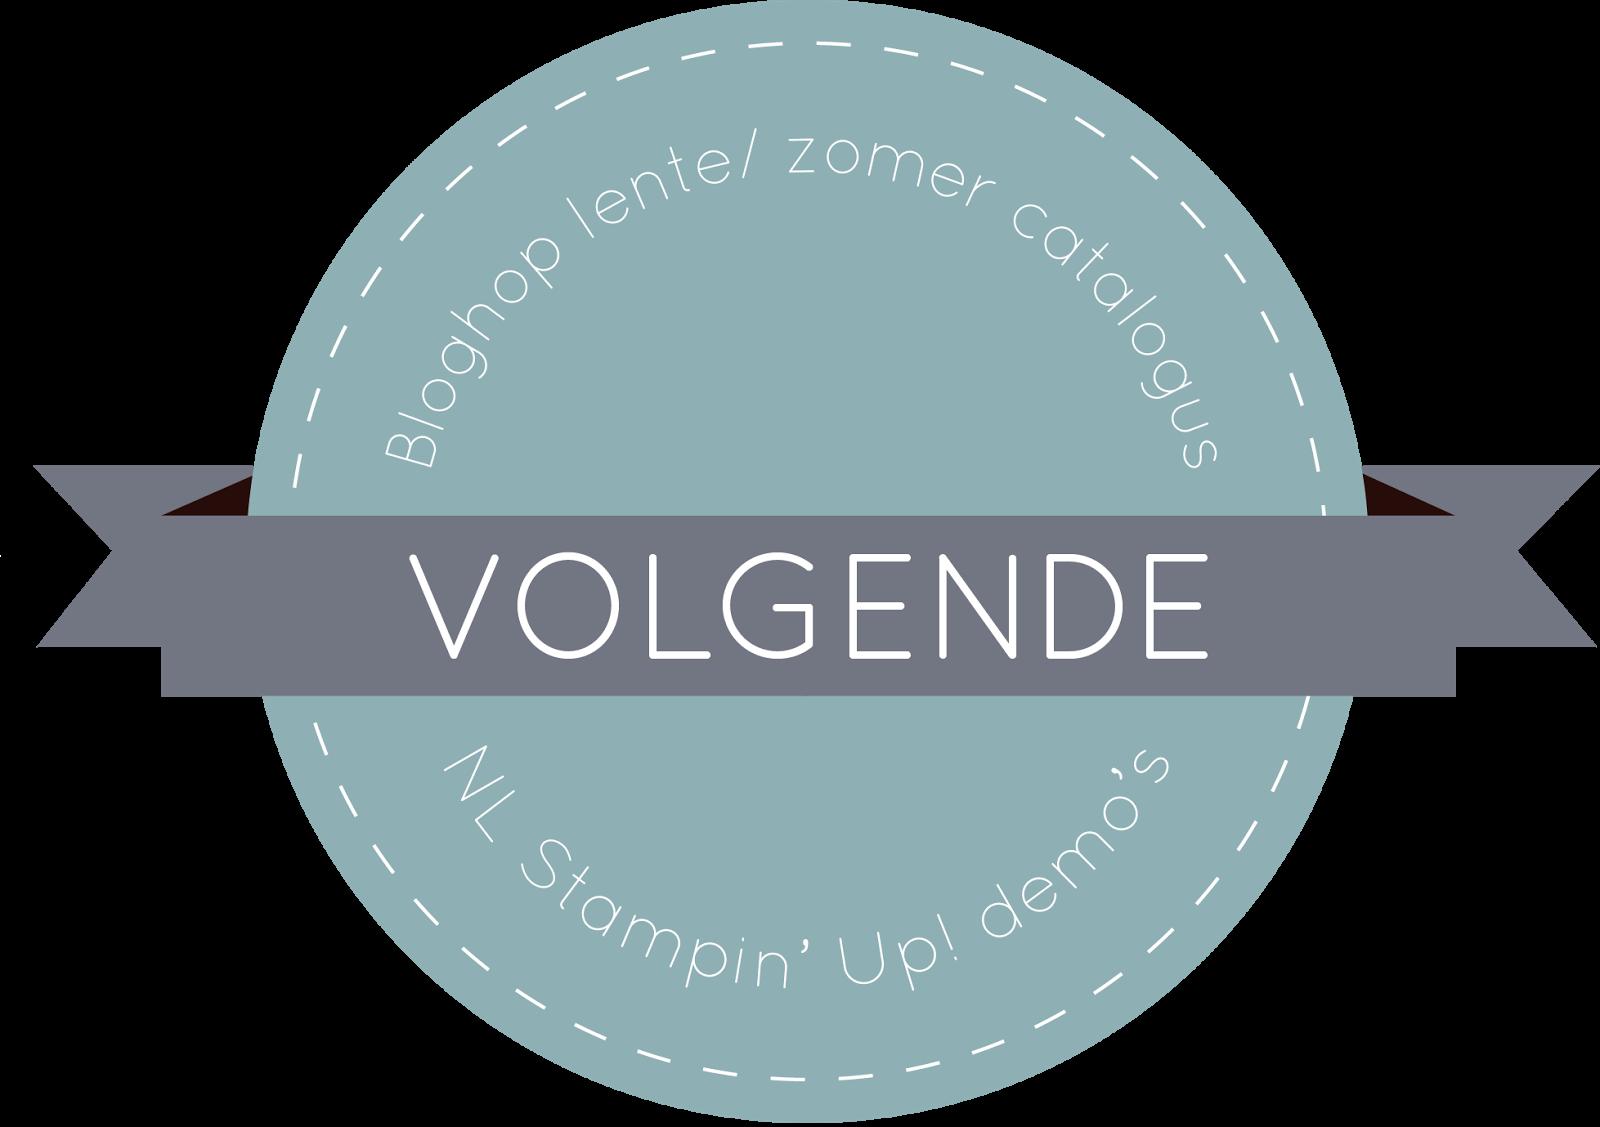 http://www.bruggetje.blogspot.nl/